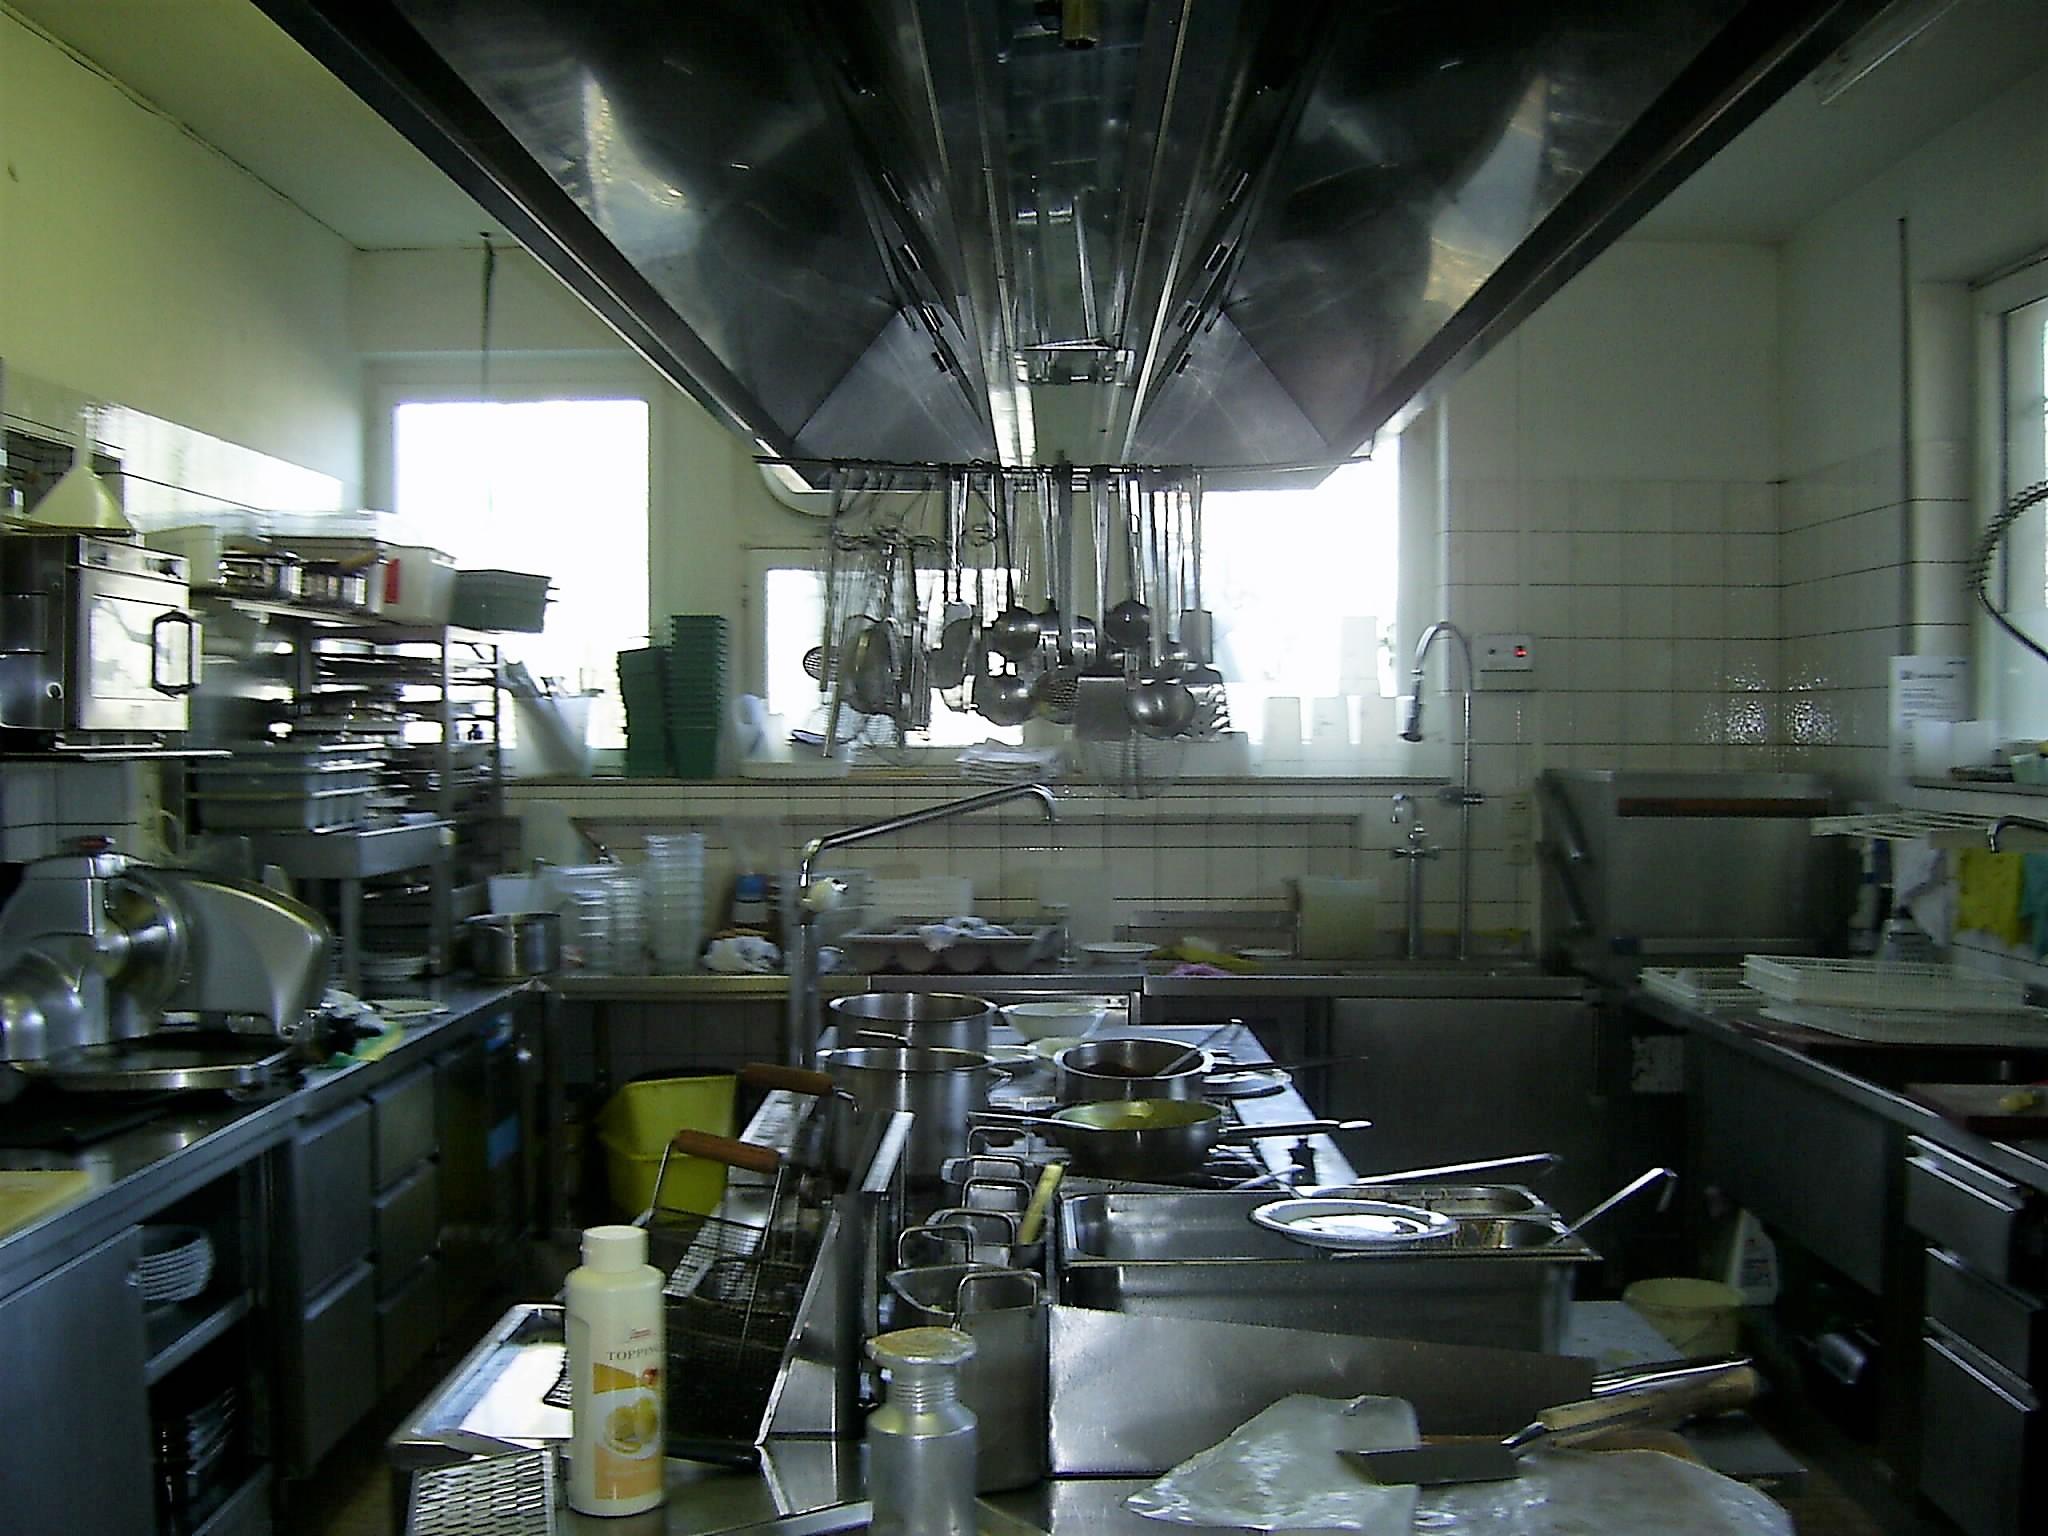 Küche – Wikipedia